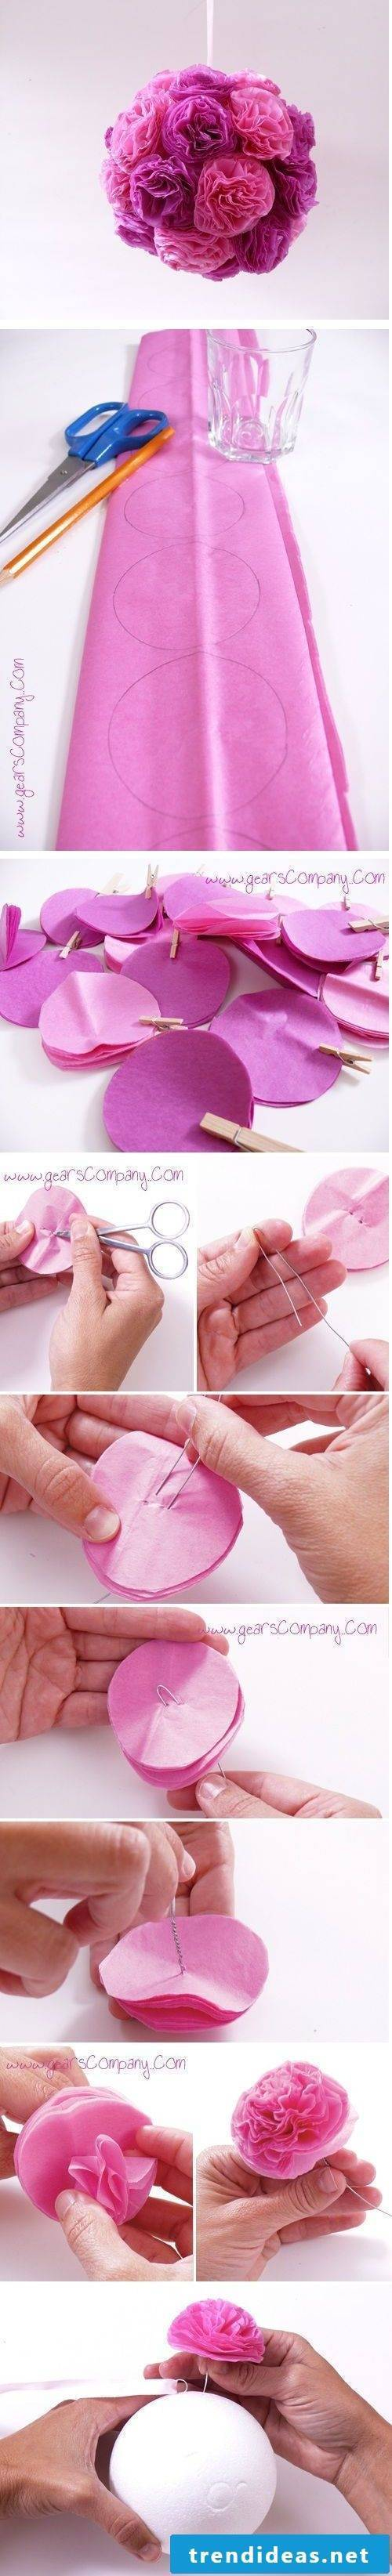 Carnation flower ball make yourself - instructions